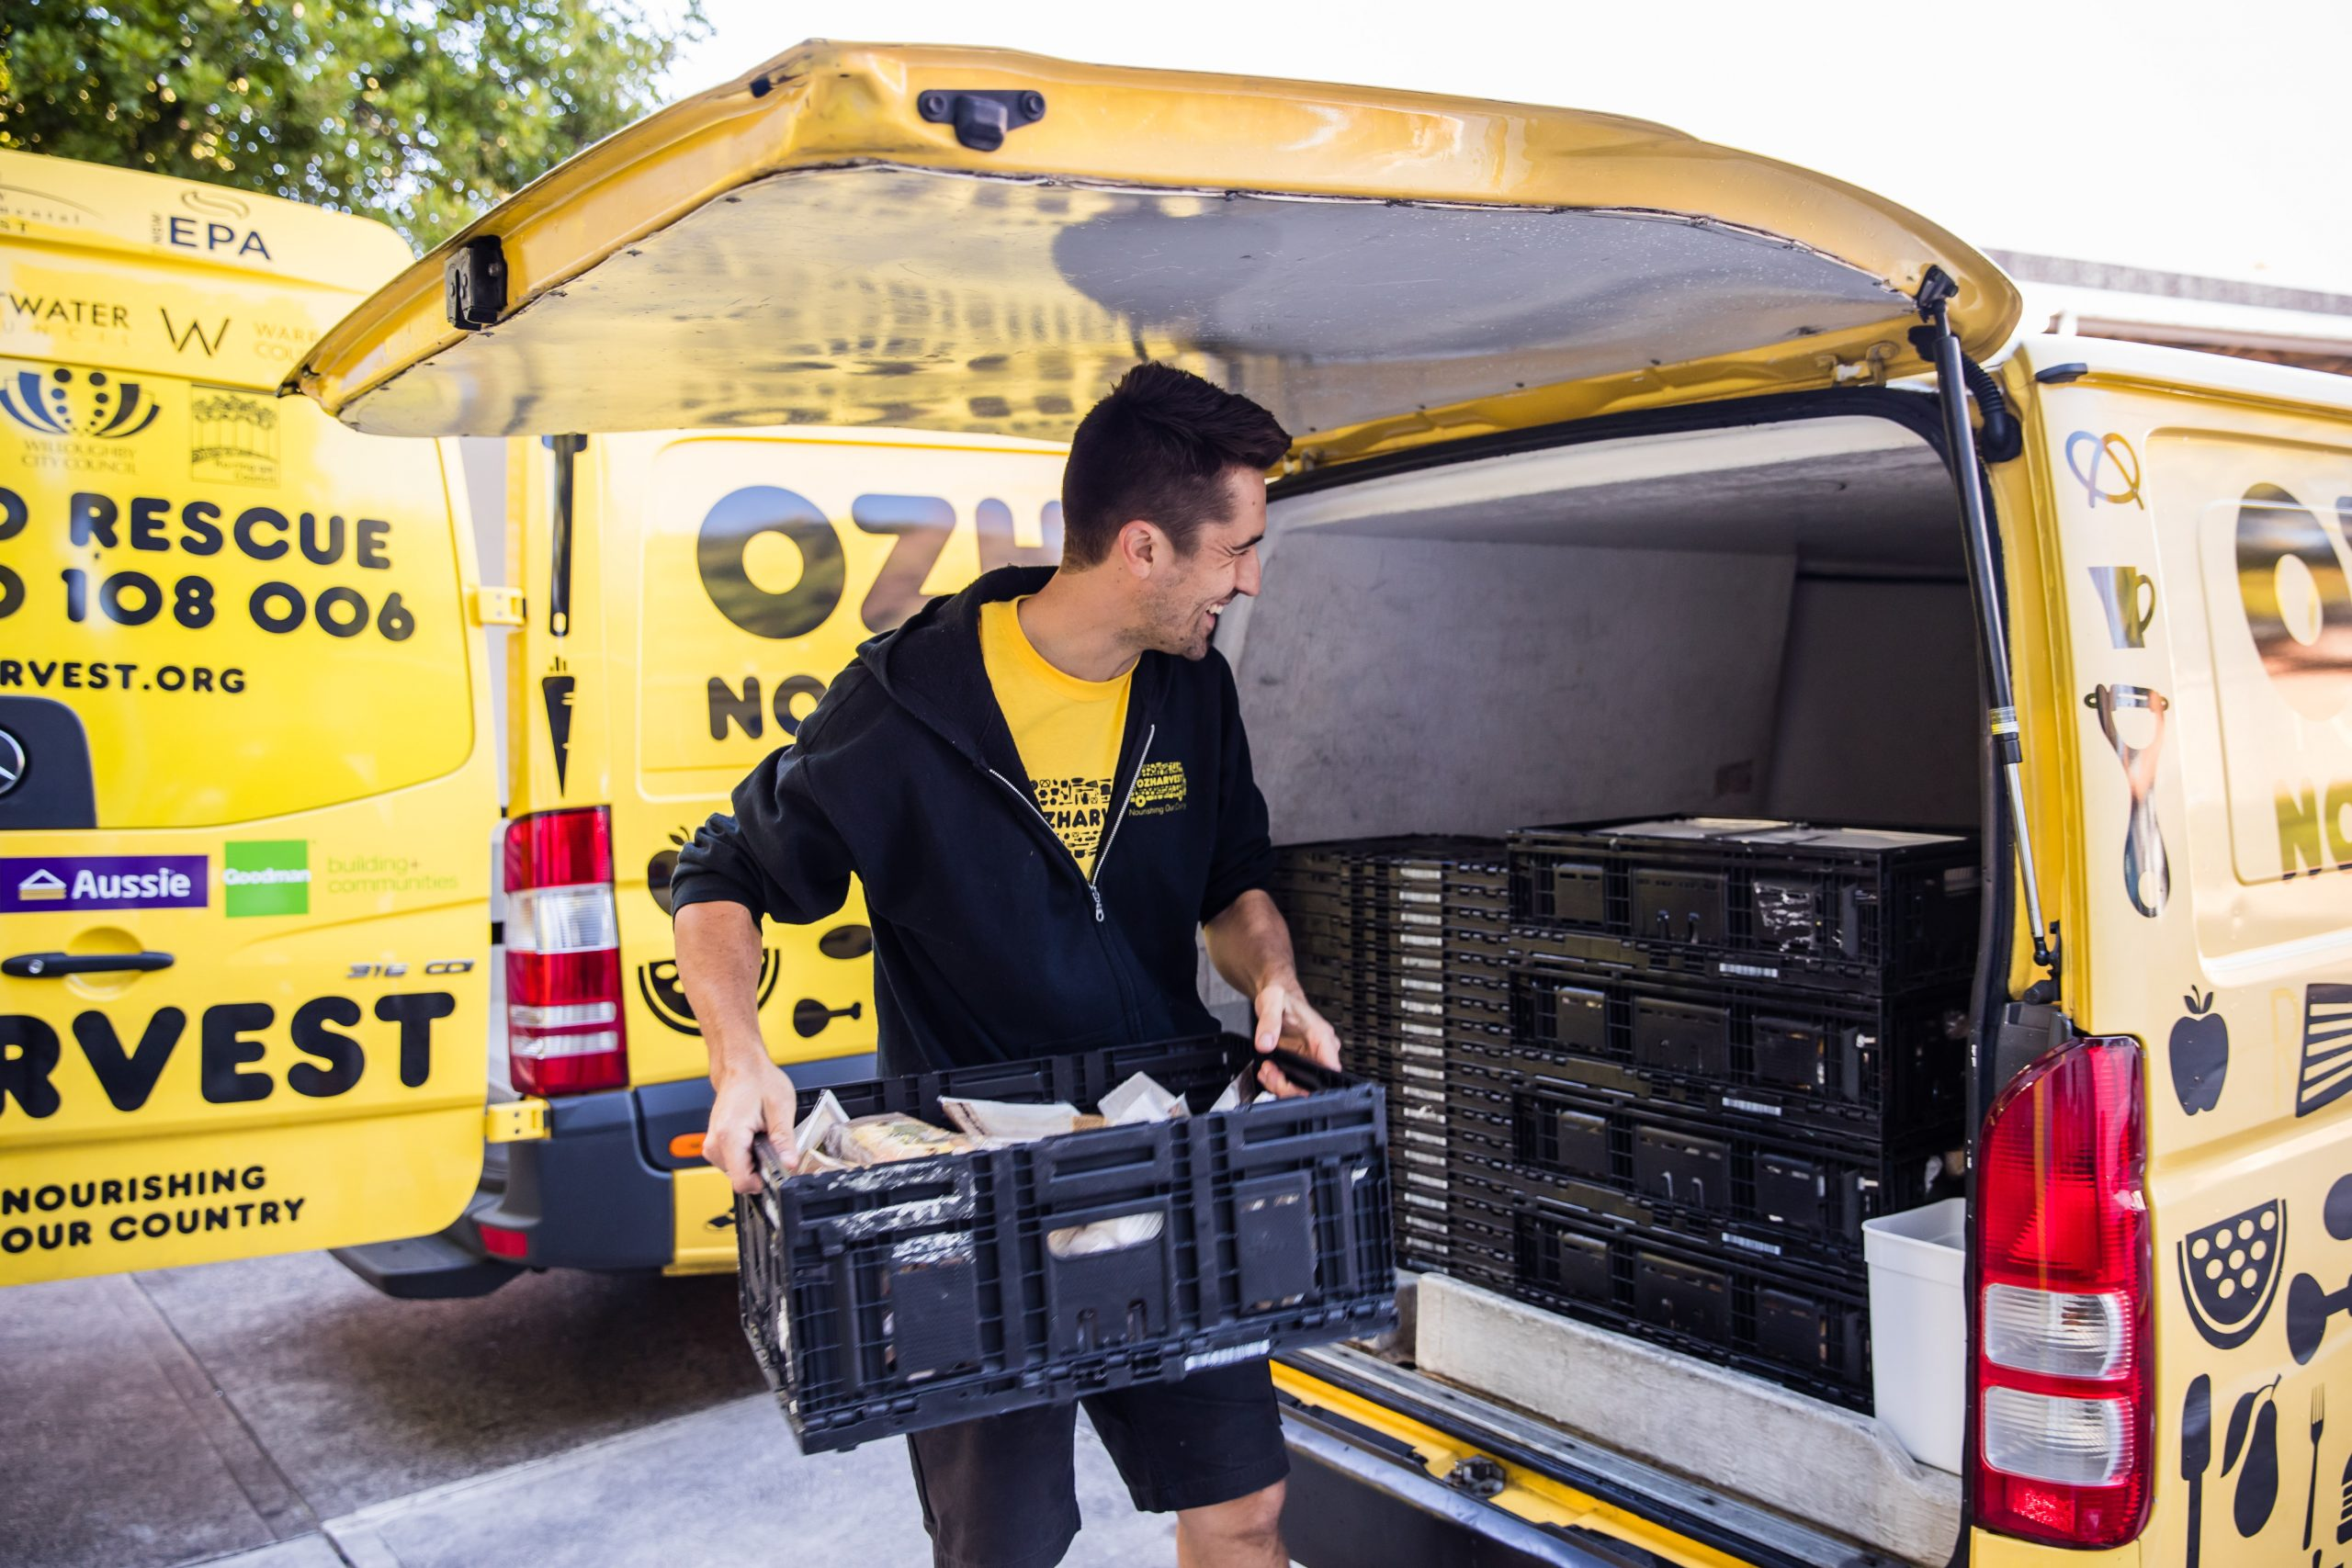 Ozharvest-food-rescue_loading-van_nikkito-1-scaled